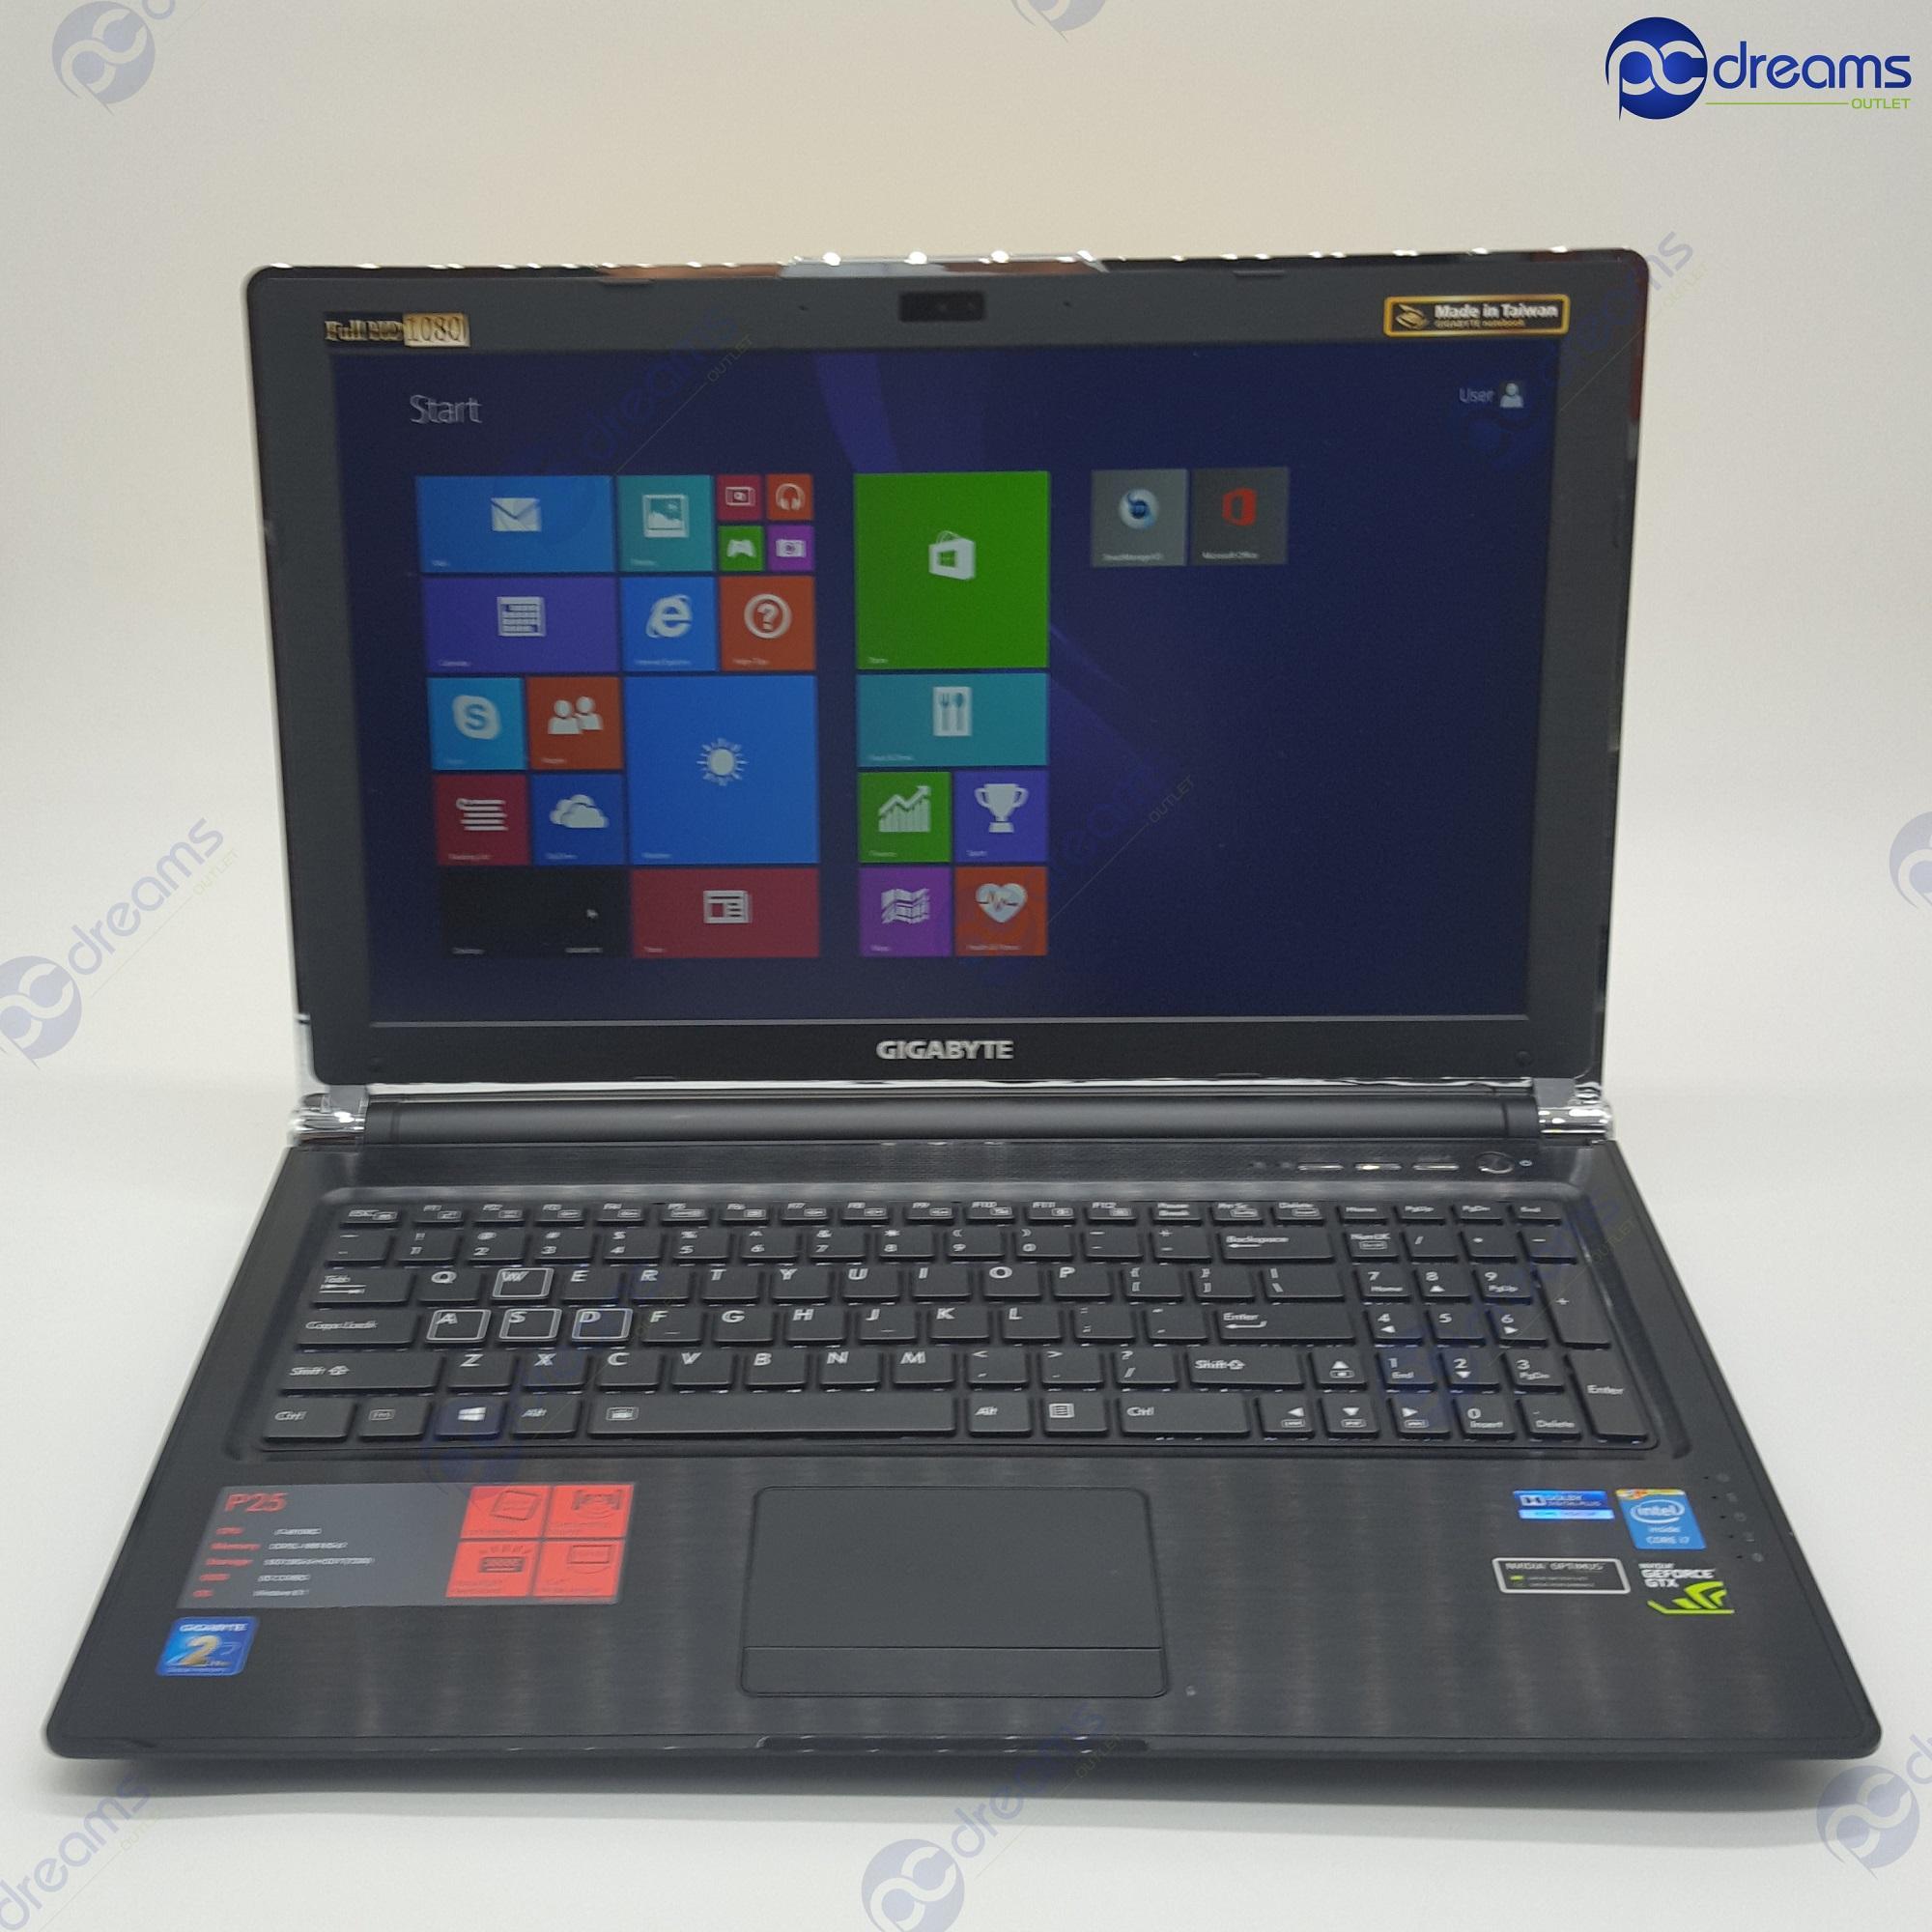 NEW YEAR PROMOTION! GIGABYTE P25X v2 i7-4810MQ/16GB/256GB SSD+1TB HDD/GTX880M [Premium Refreshed]